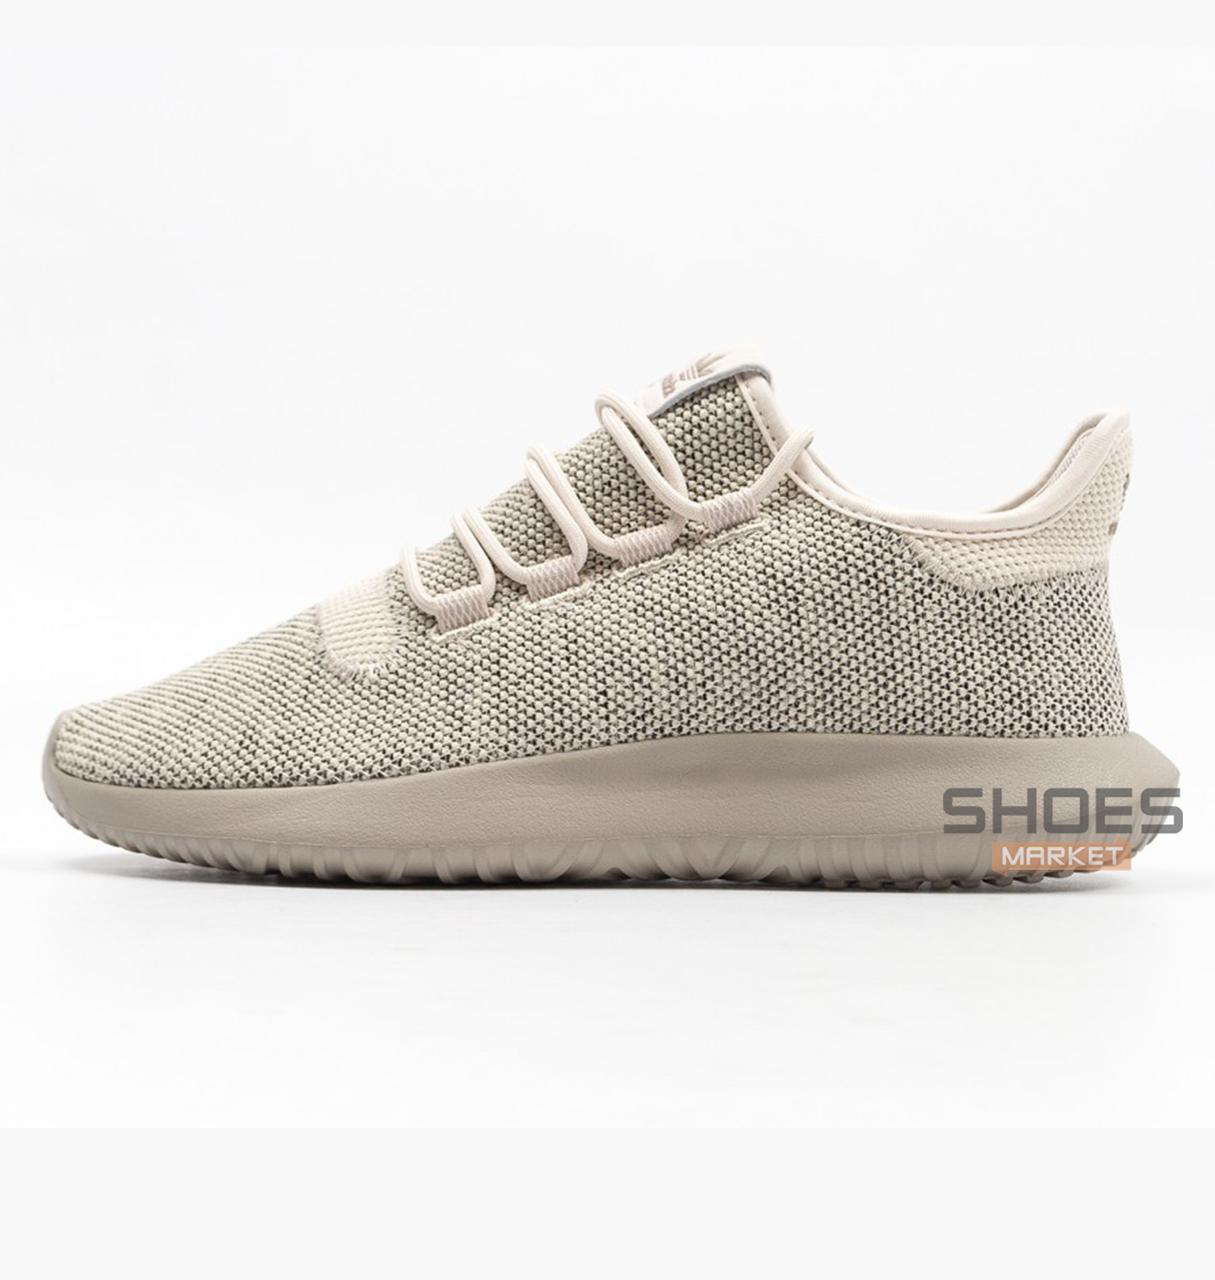 52e8b5434 Мужские кроссовки Adidas Tubular Shadow Knit Beige BB8824, оригинал -  Интернет-магазин обуви и